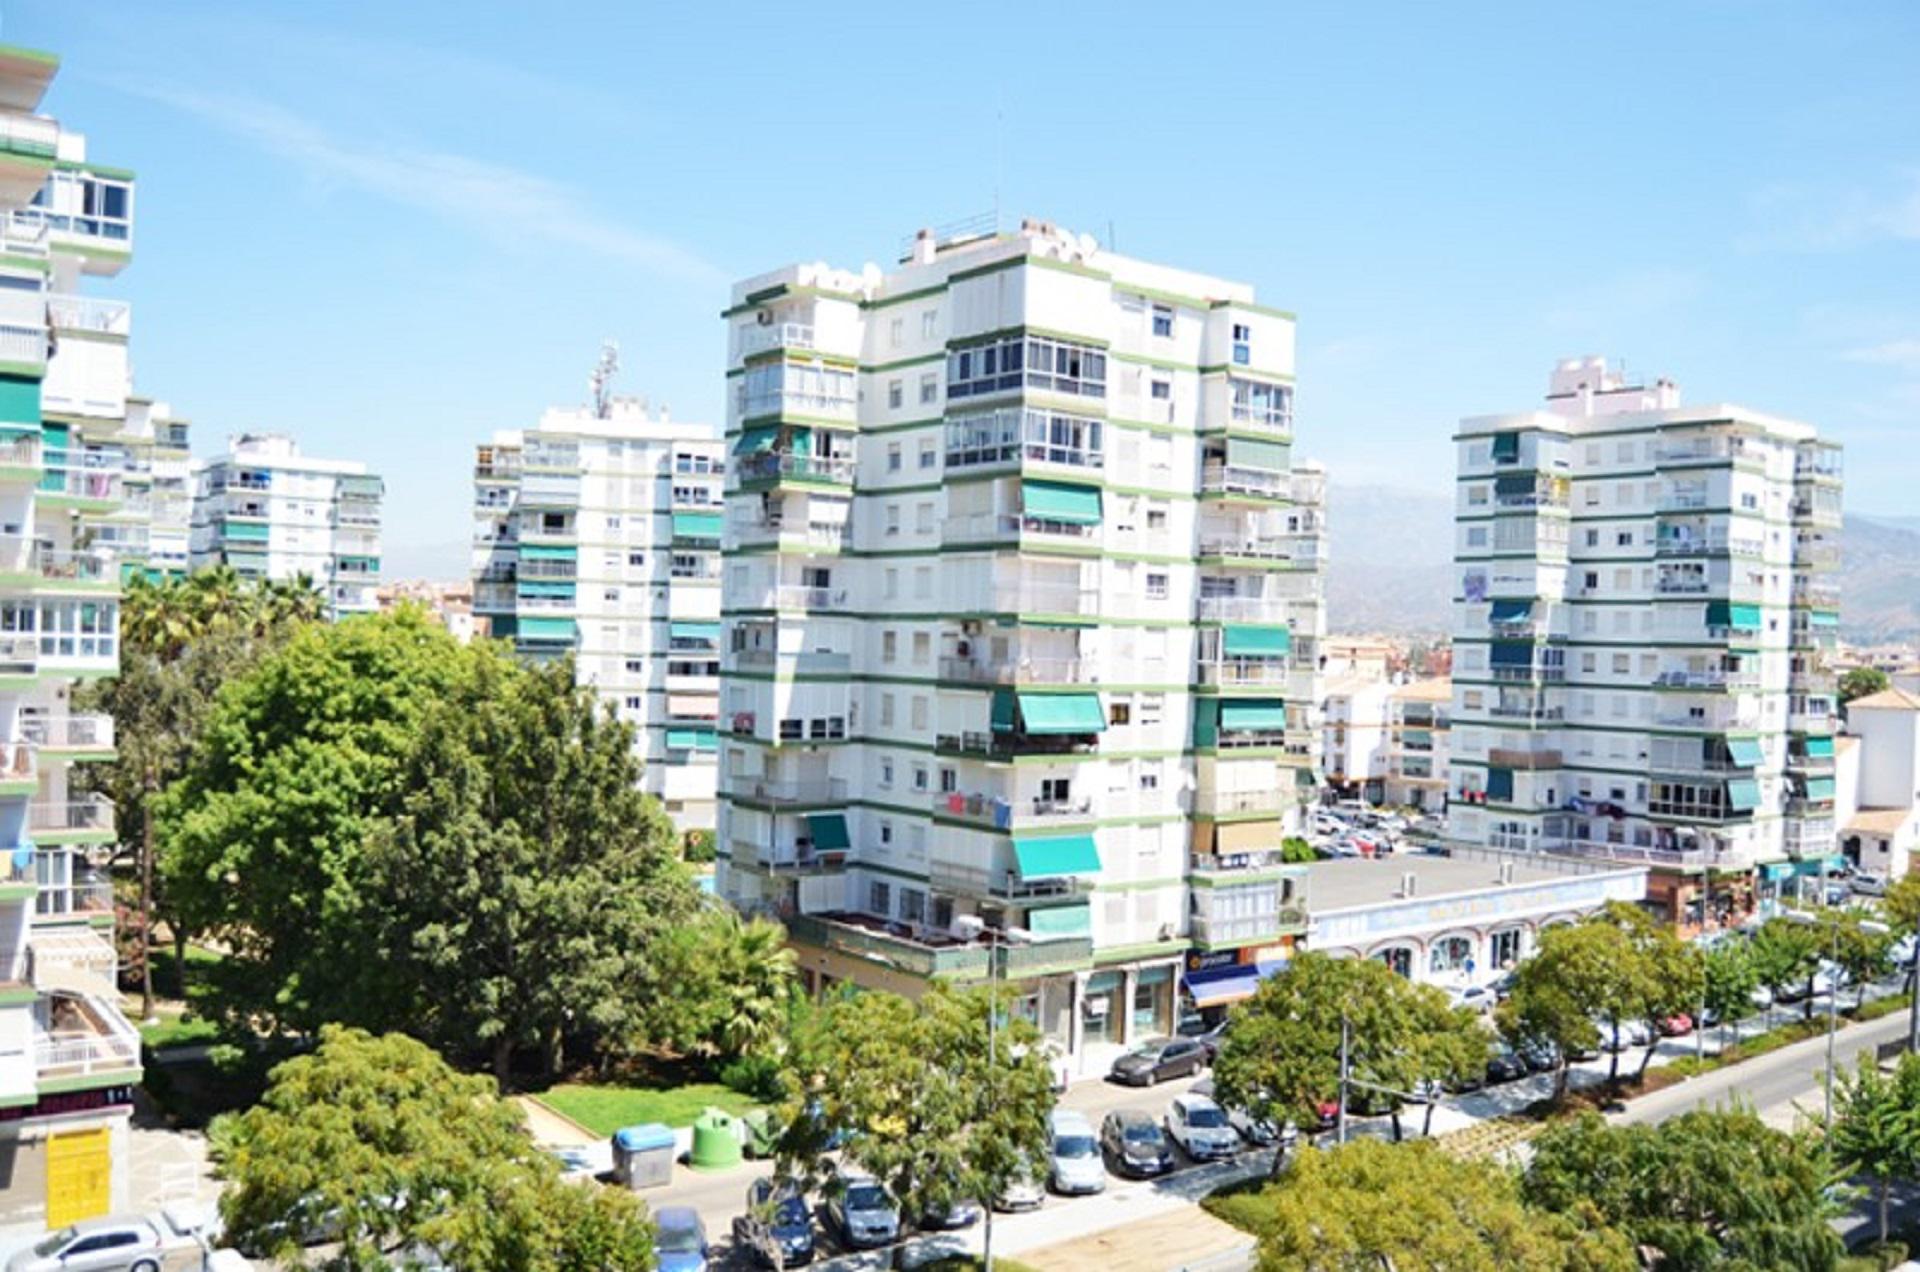 Piso -                                       Torre Del Mar -                                       0 dormitorios -                                       3 ocupantes